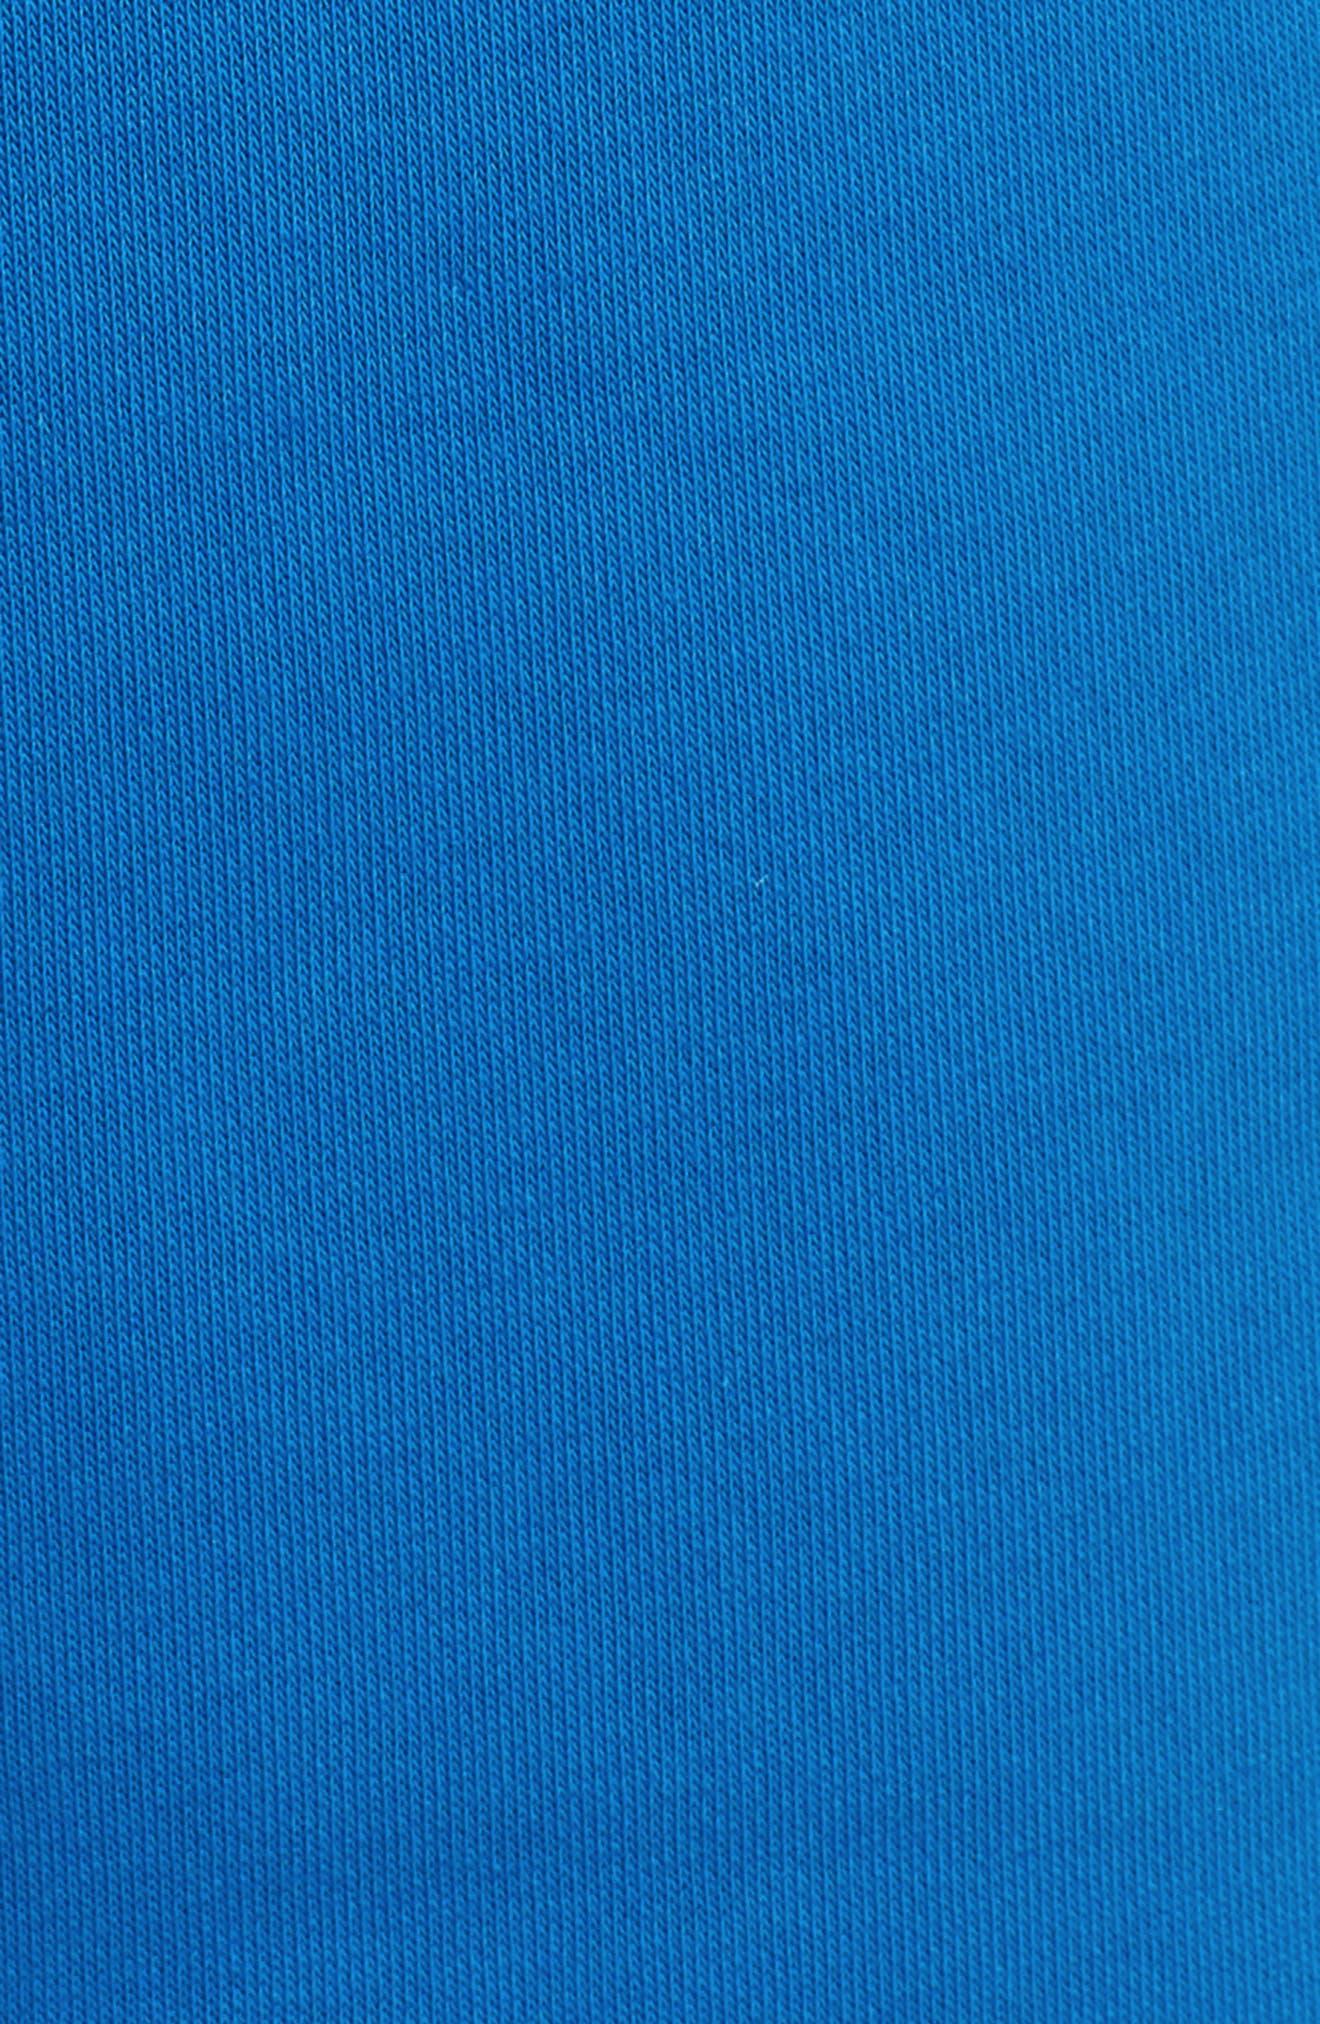 Sportswear Air Fleece Shorts,                             Alternate thumbnail 5, color,                             Blue Nebula/ Anthracite/ White